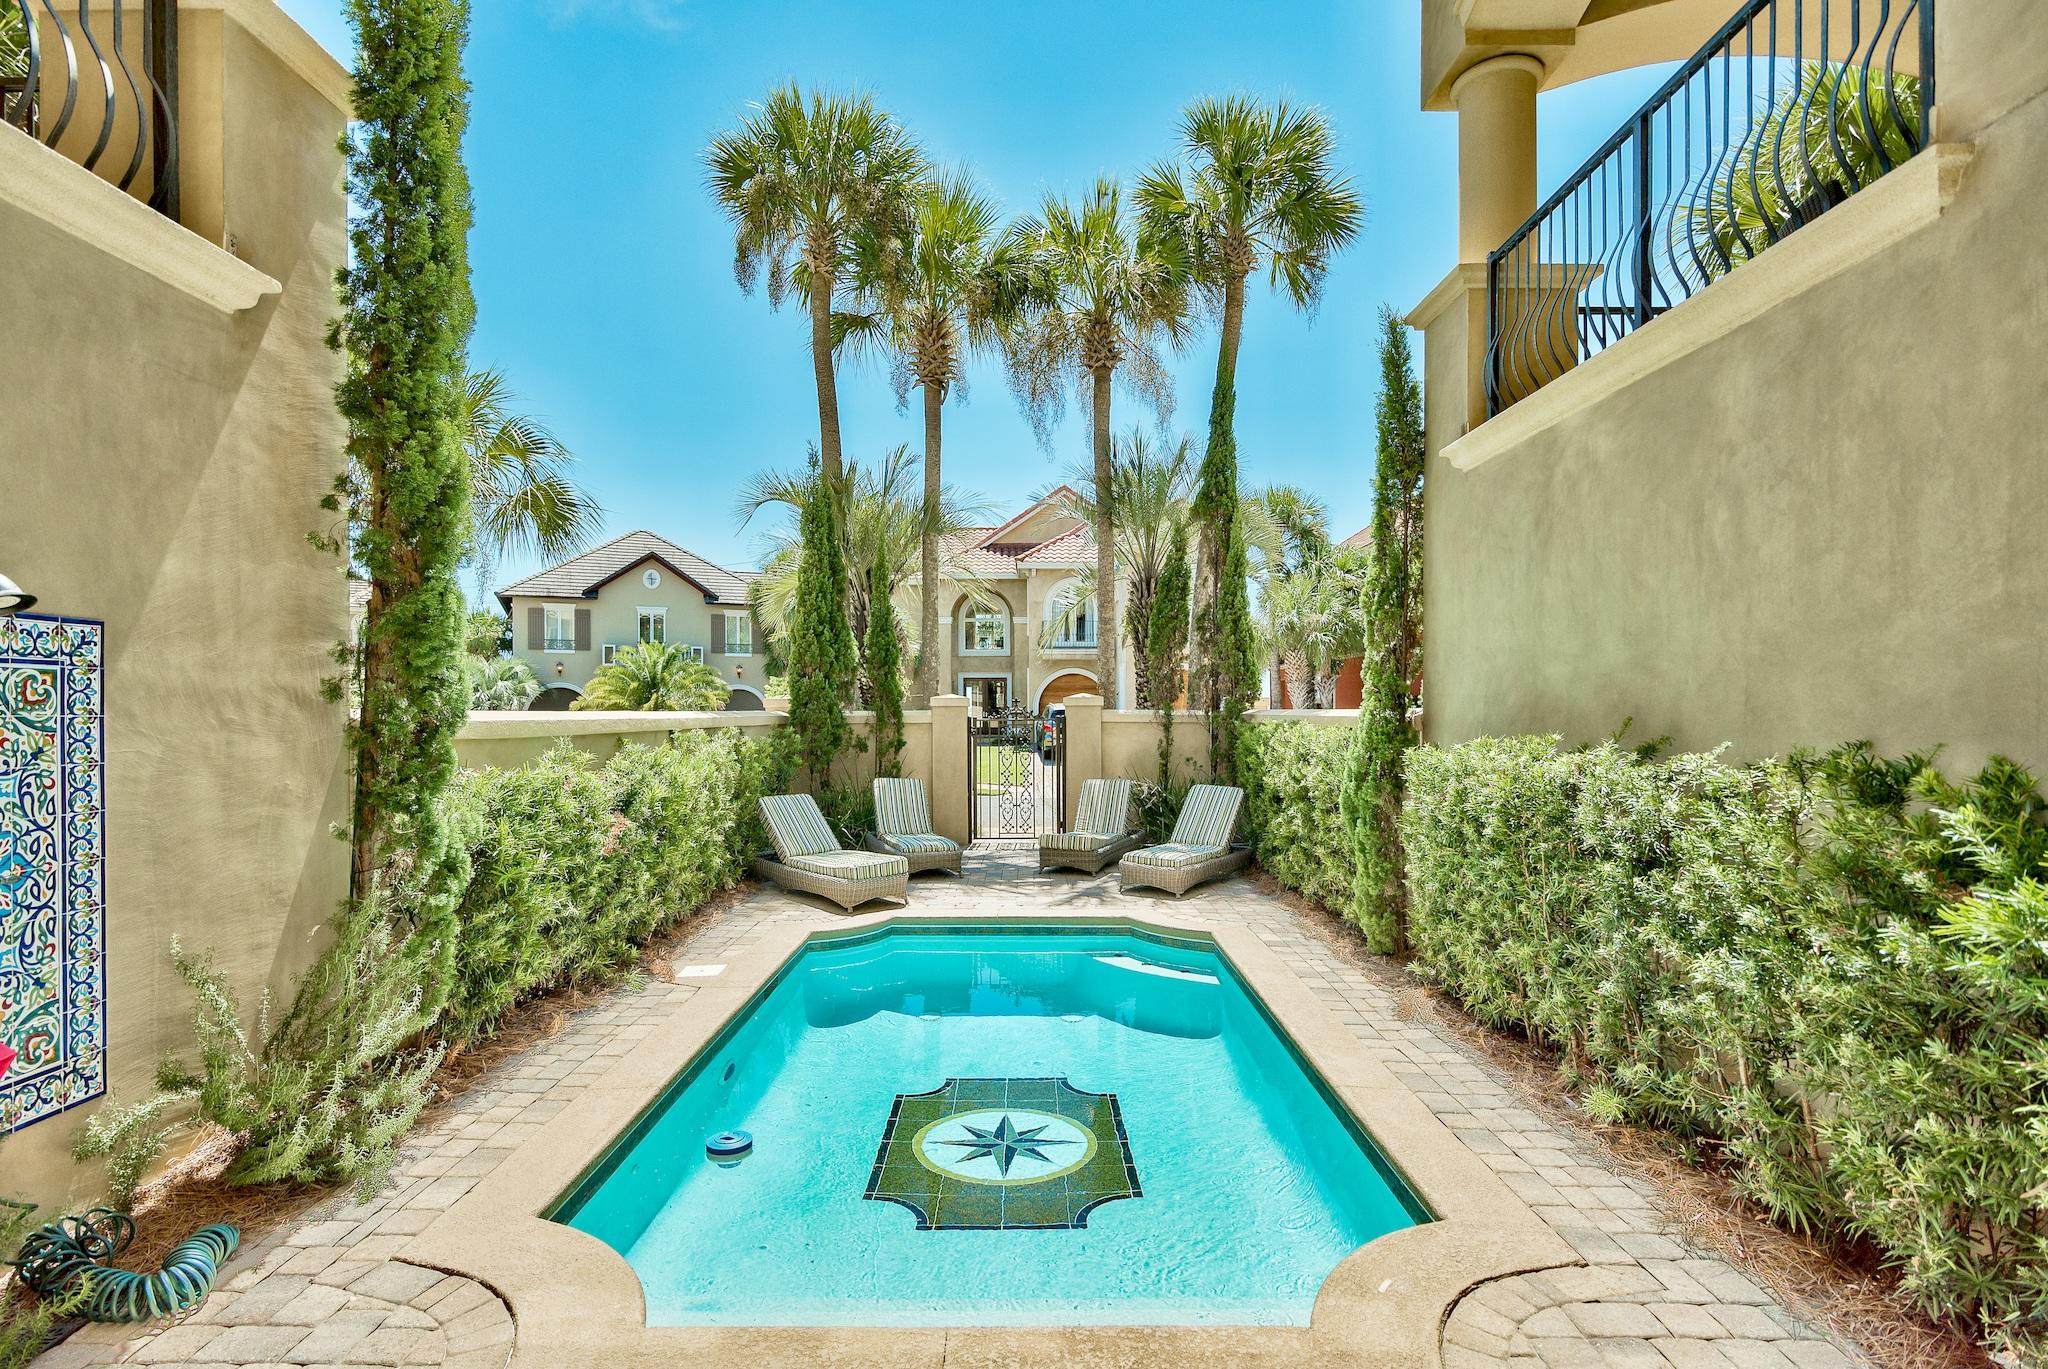 A 5 Bedroom 5 Bedroom Avalon Beach Estates Home